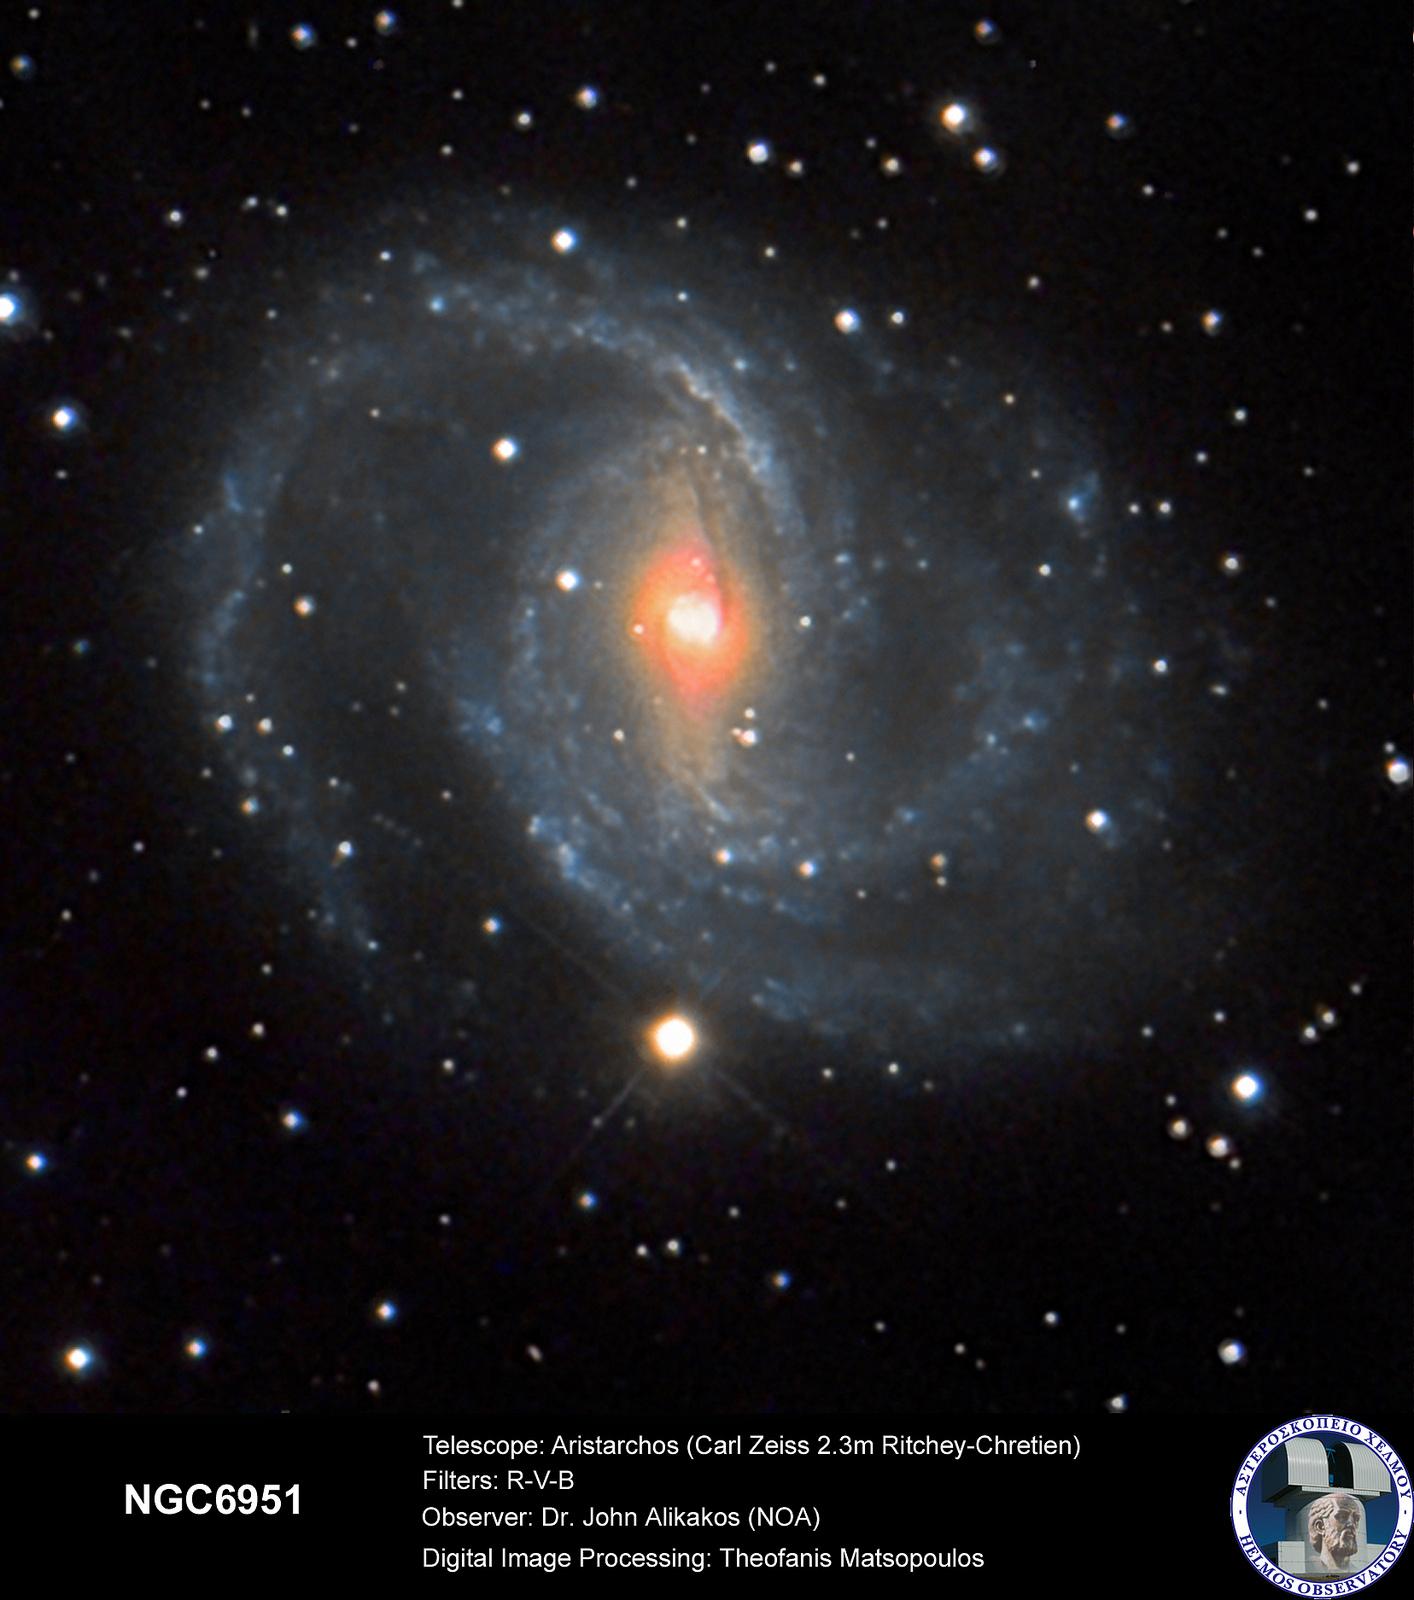 Aristarchos Telescope NGC6951 by Theofanis Matsopoulos